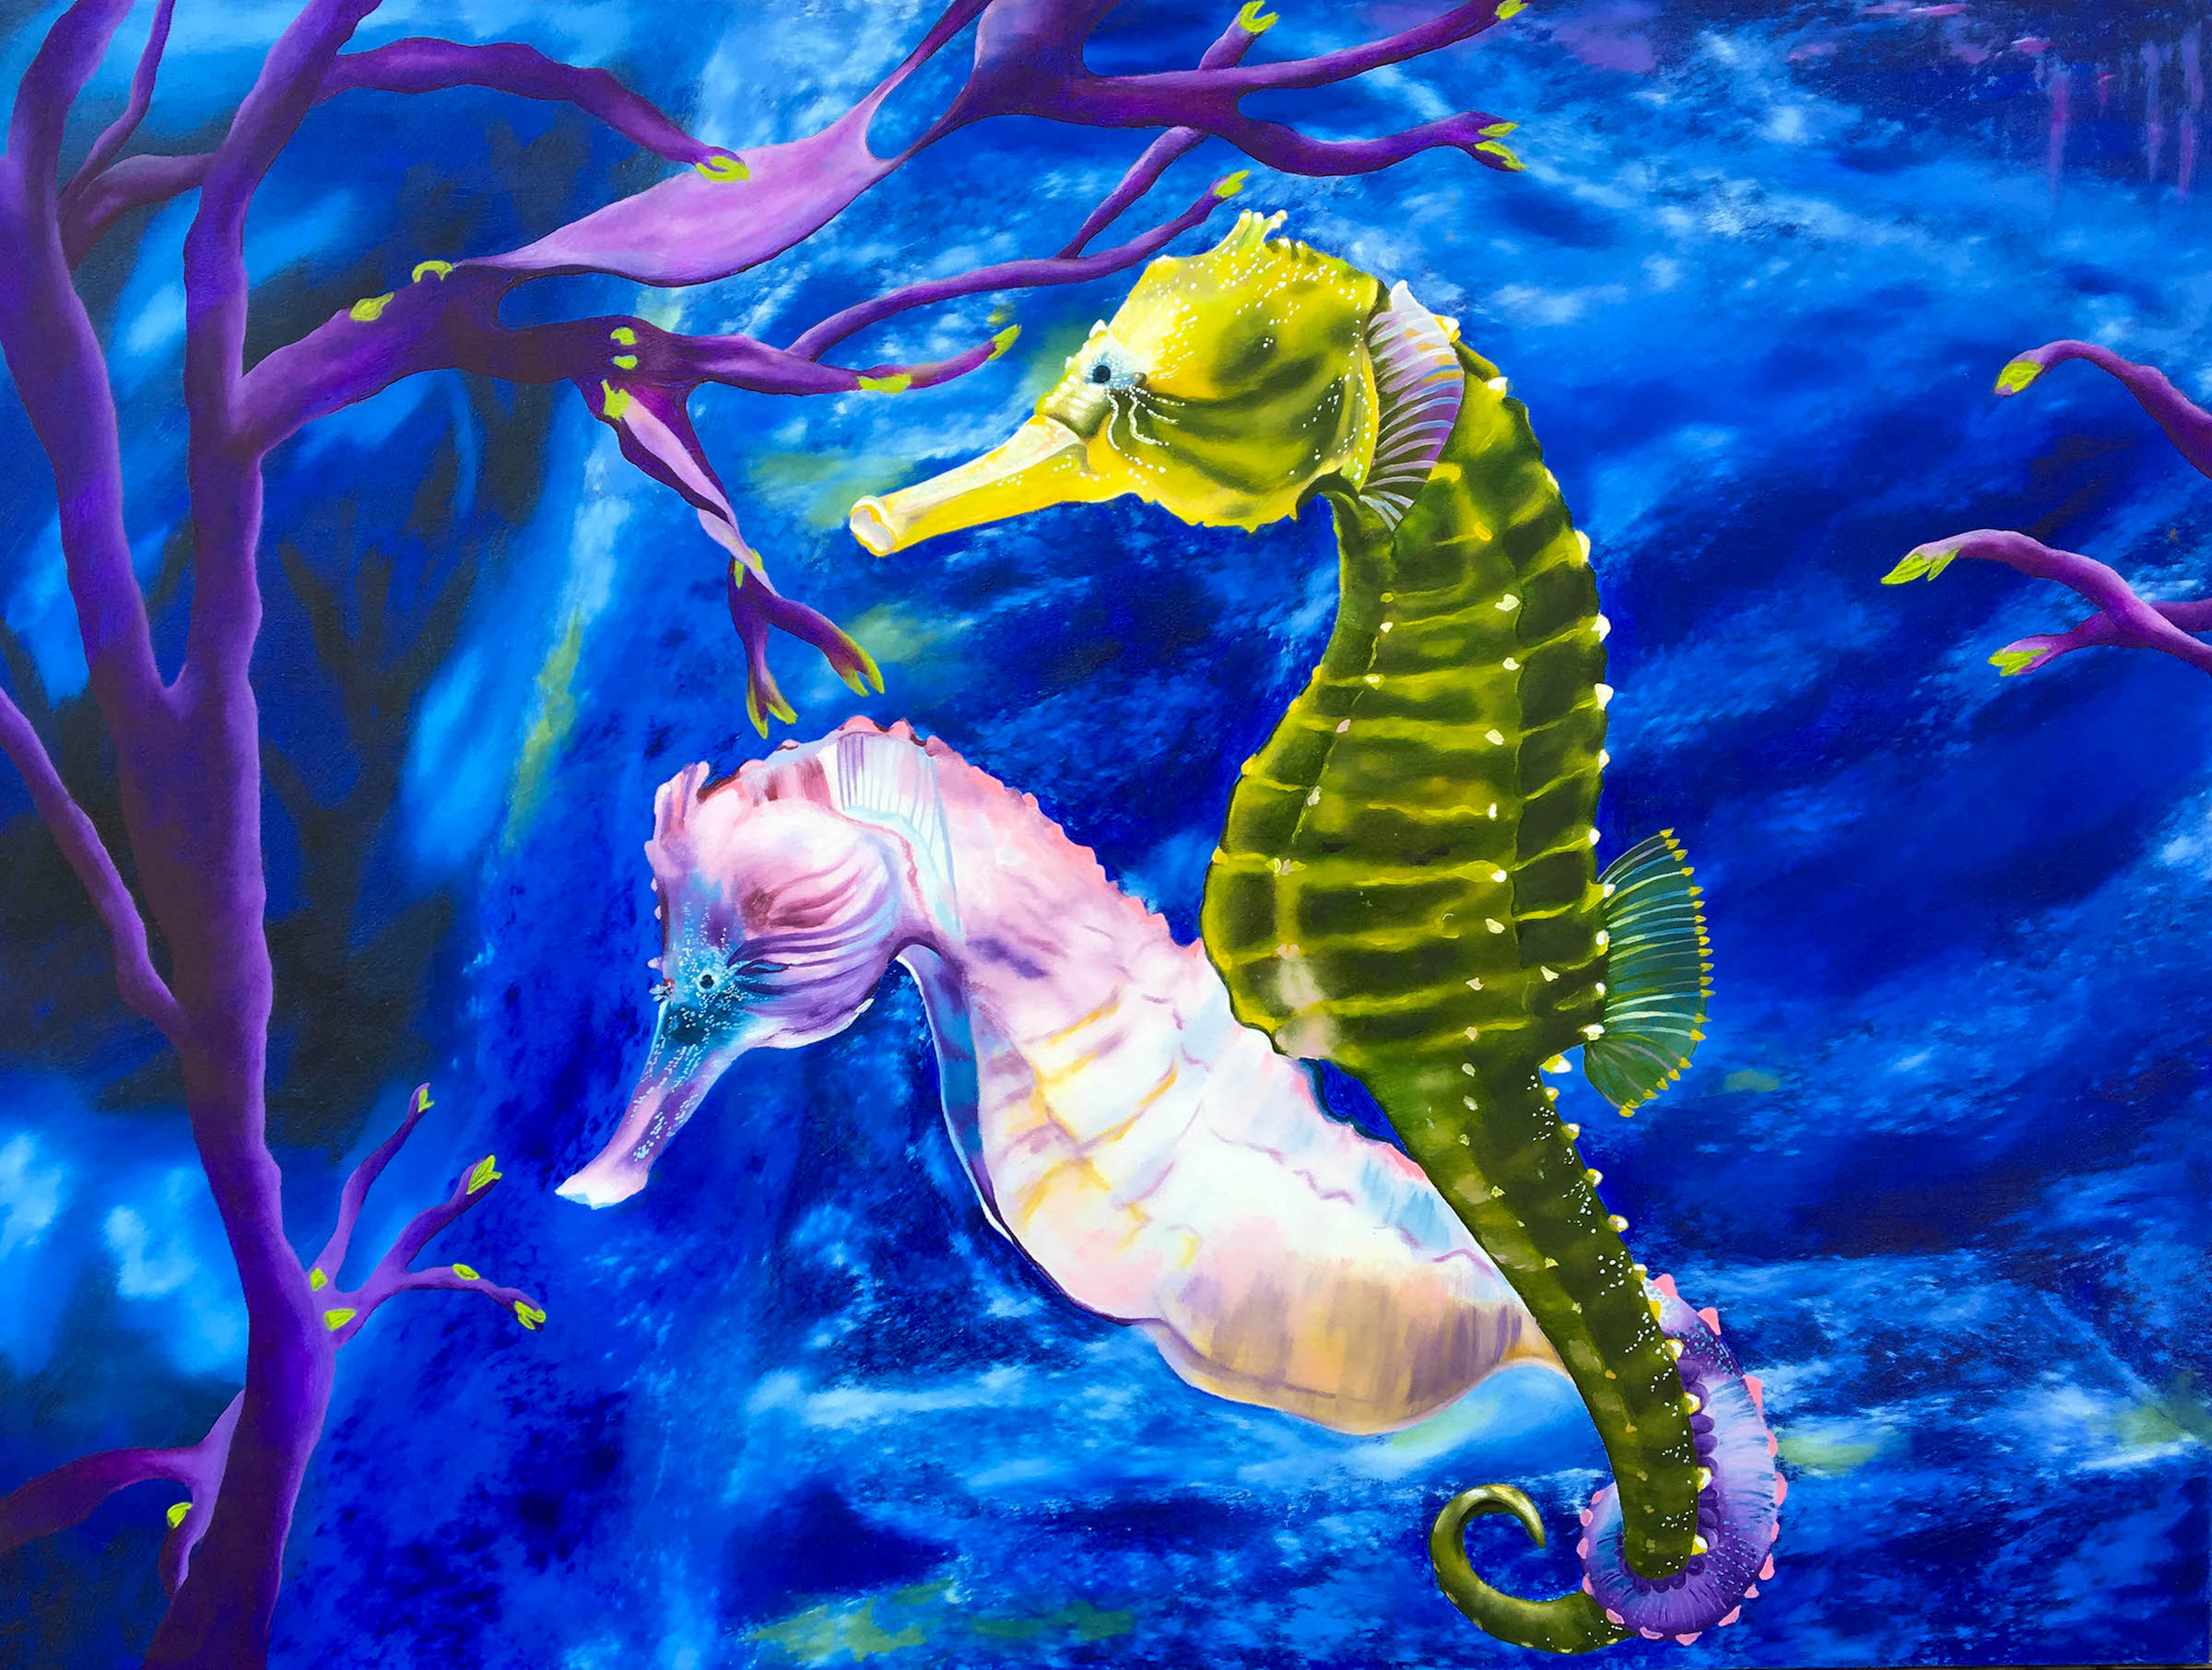 Seahorse mates